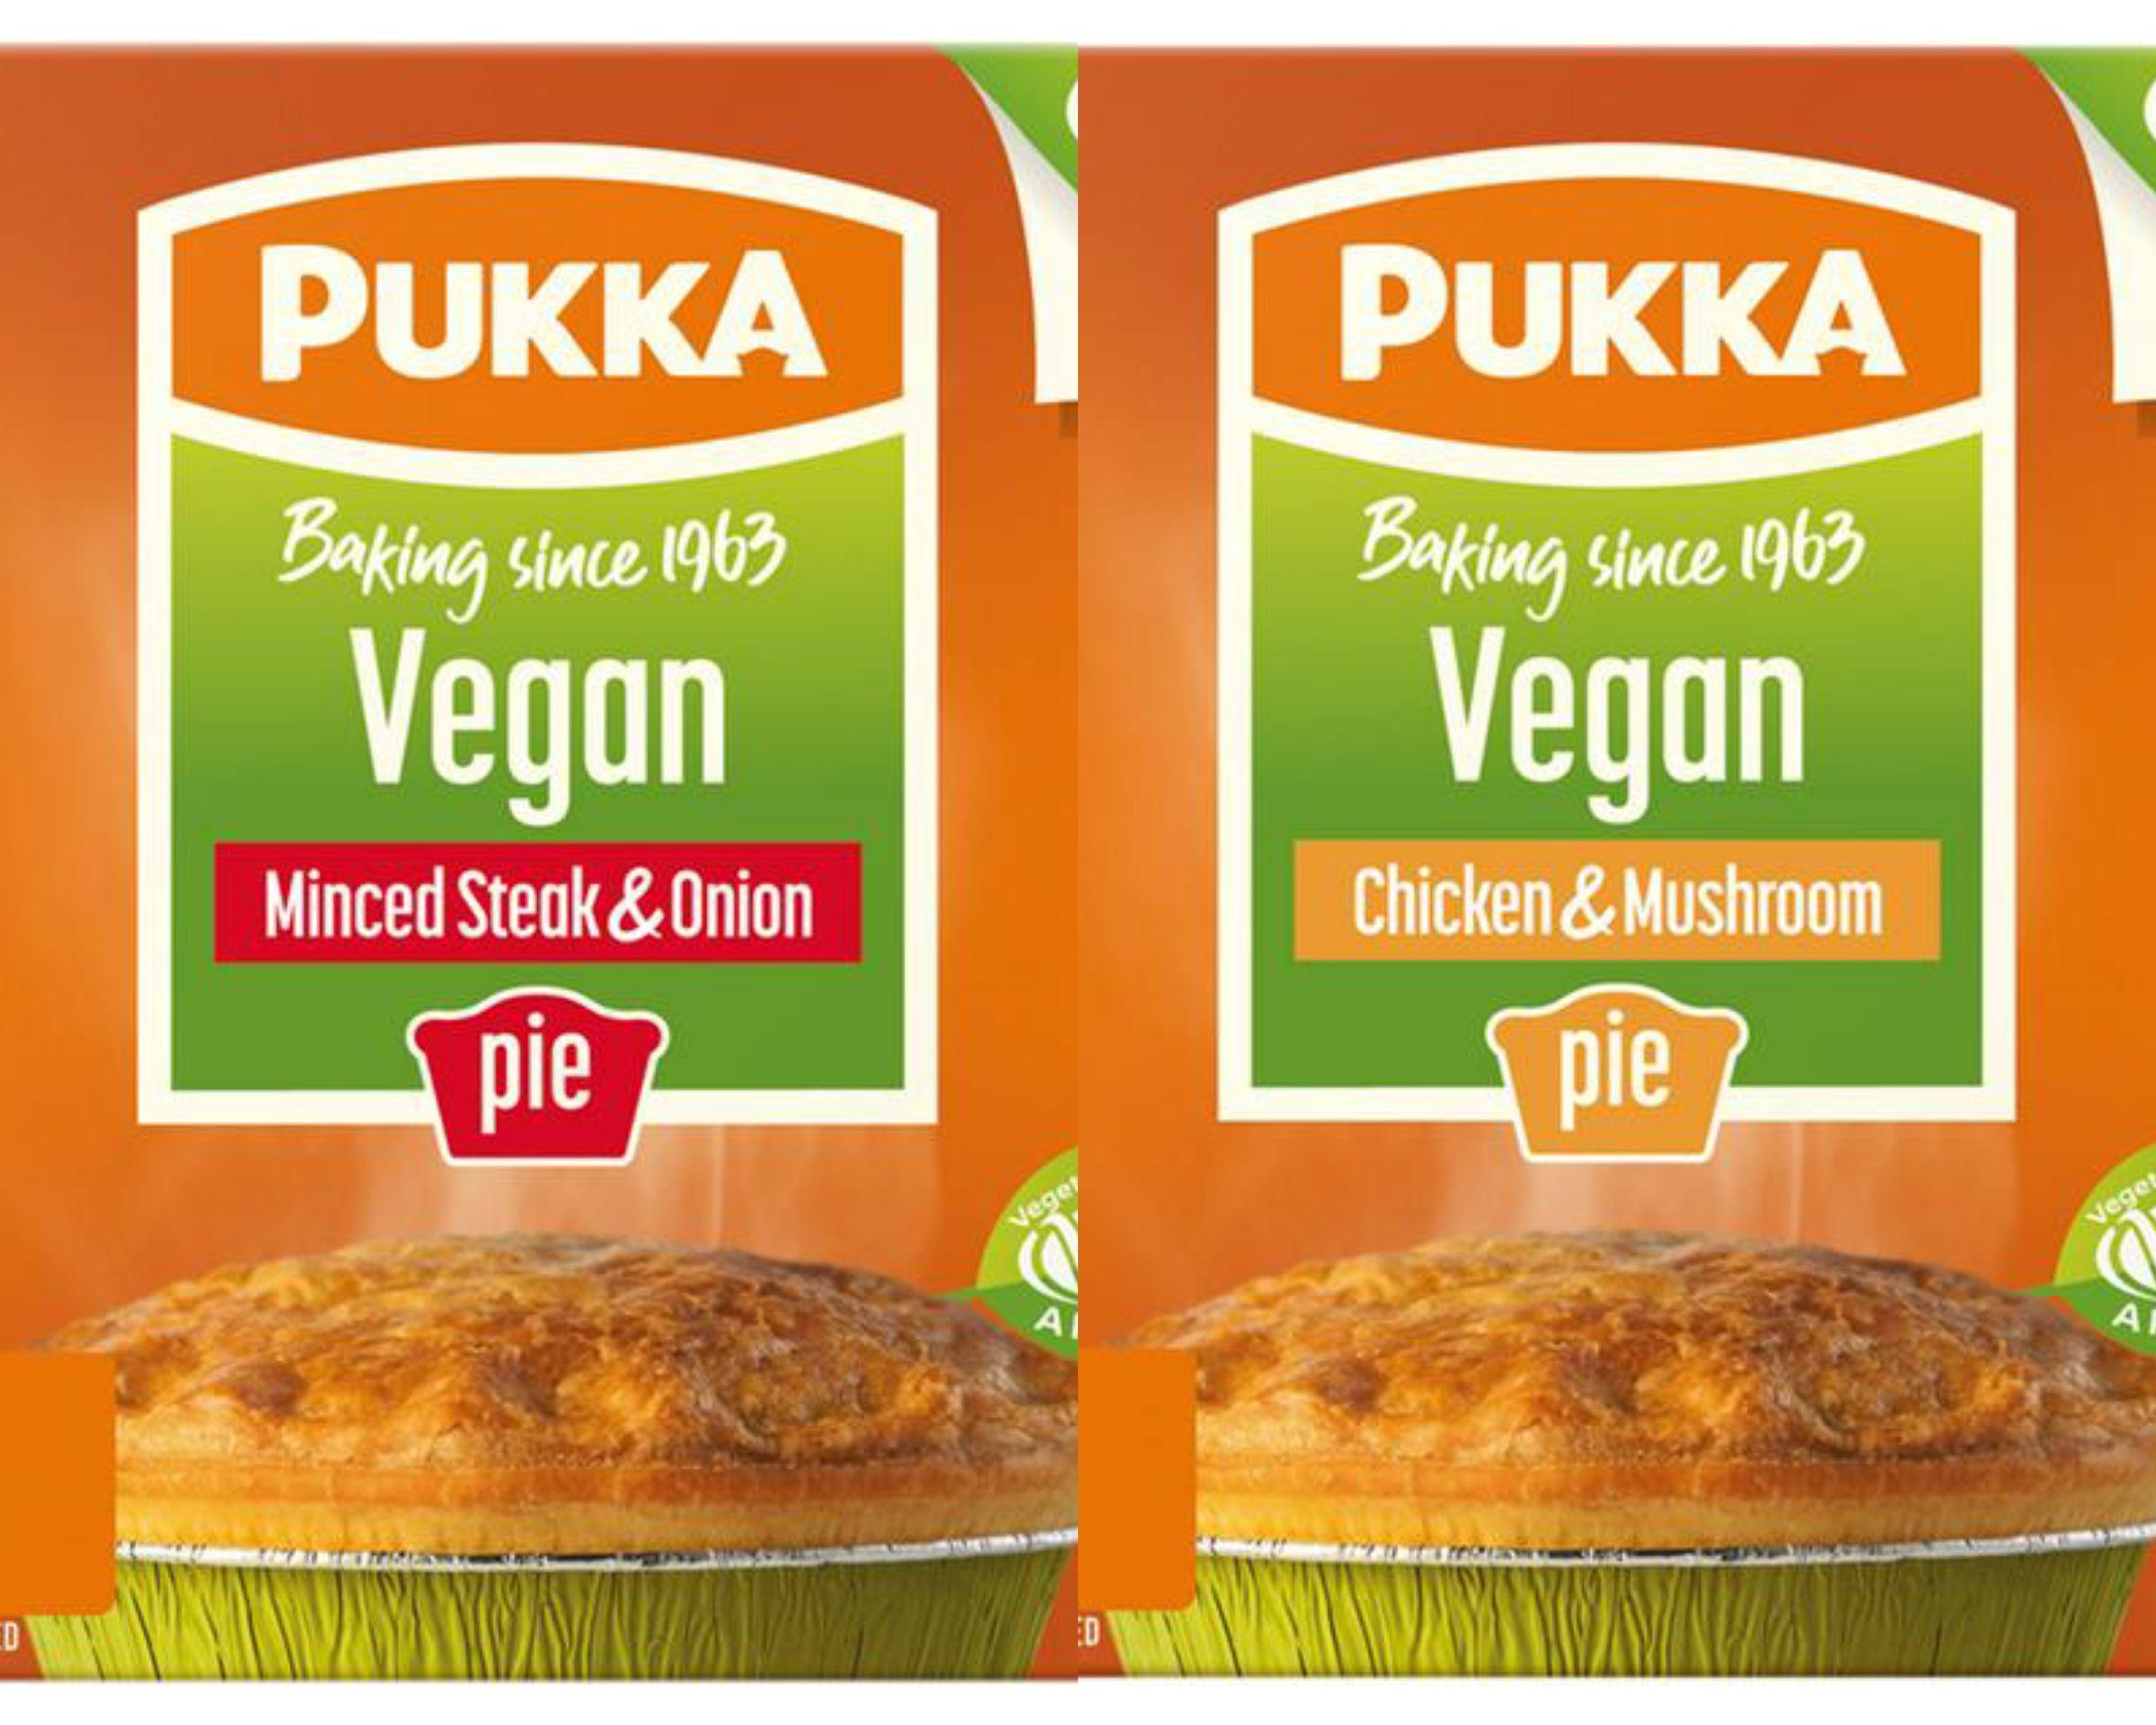 Pukka Vegan Chicken & Mushroom Pie or Pukka Vegan Minced Steak & Onion Pie £1 @ Sainsbury's